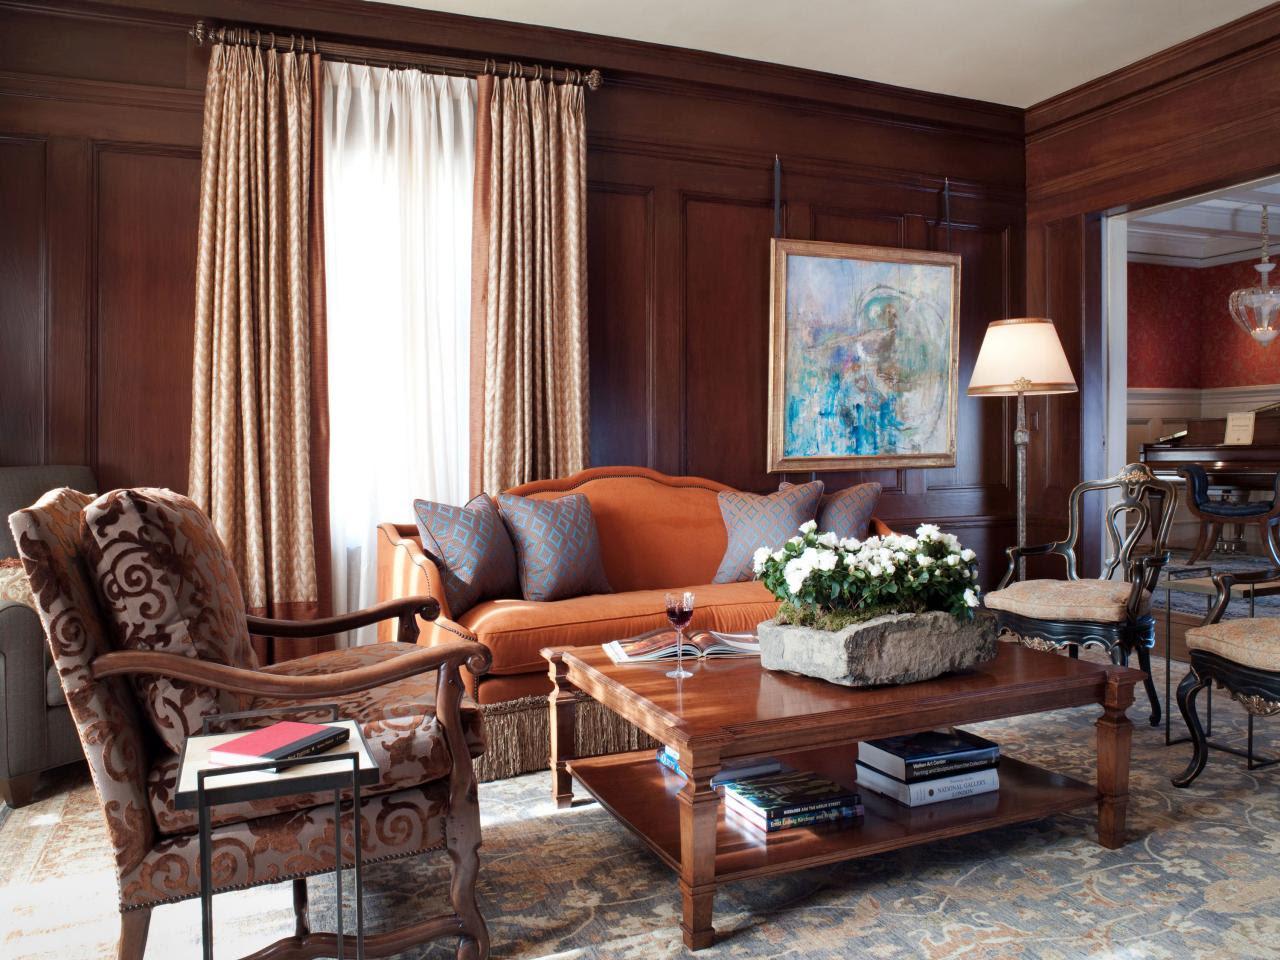 Warm and Welcoming Living Room | Kathy Geissler Best | HGTV